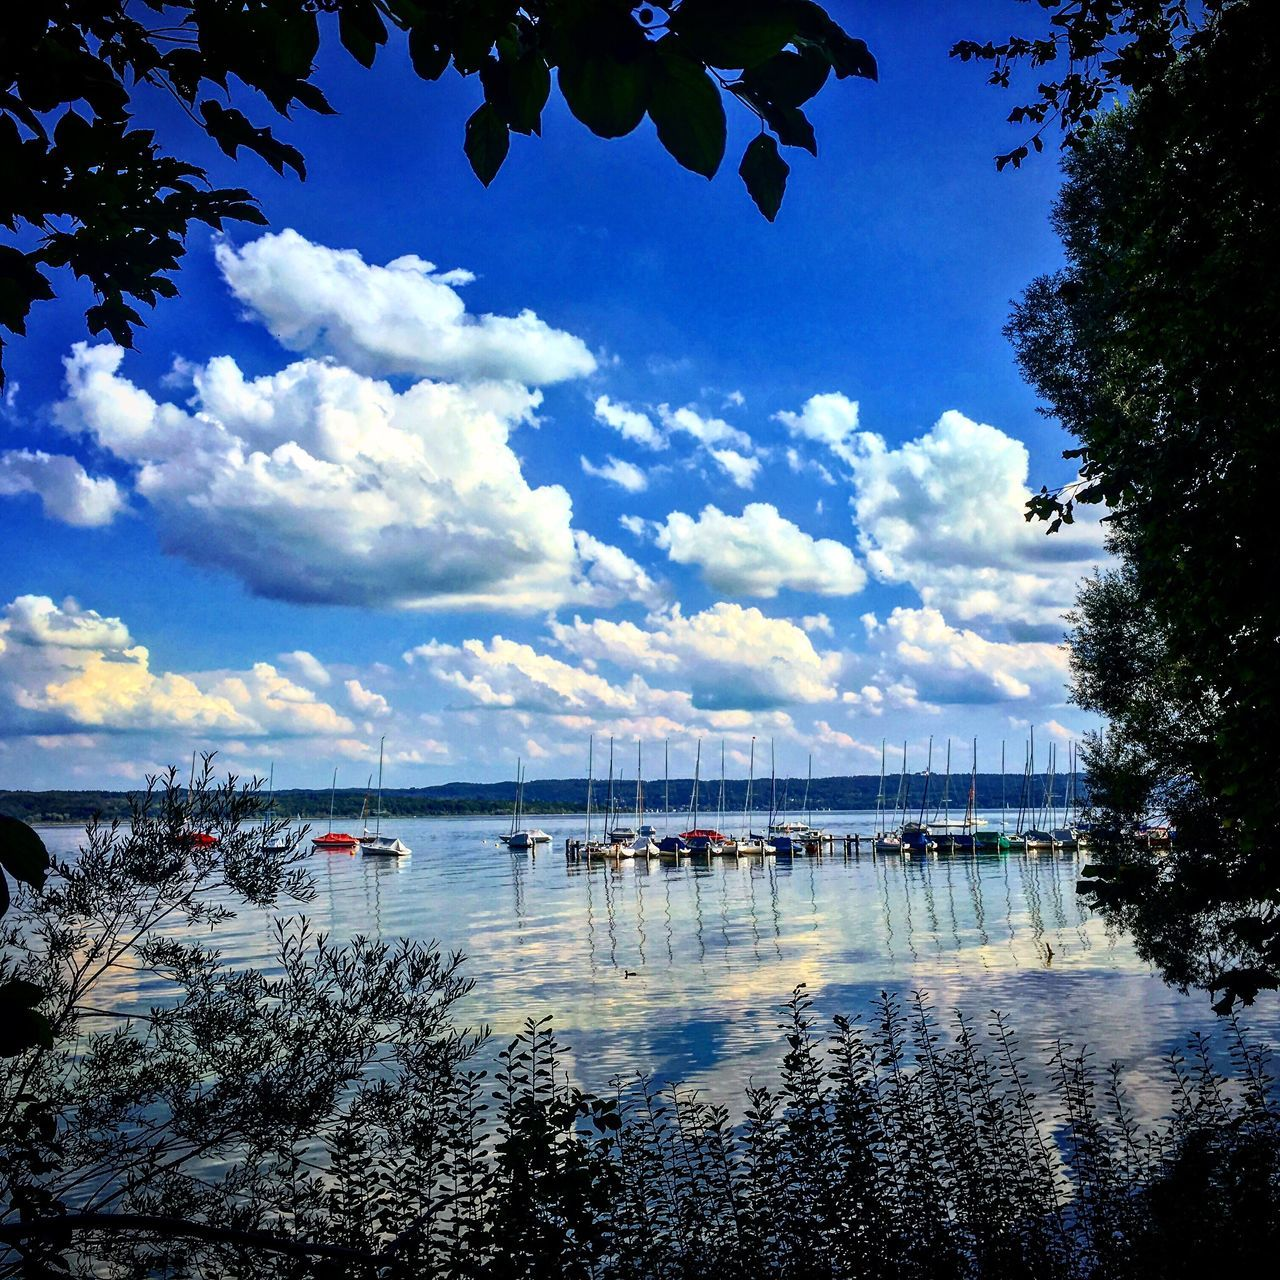 Water Sky Cloud - Sky Blue Sailboat Nature